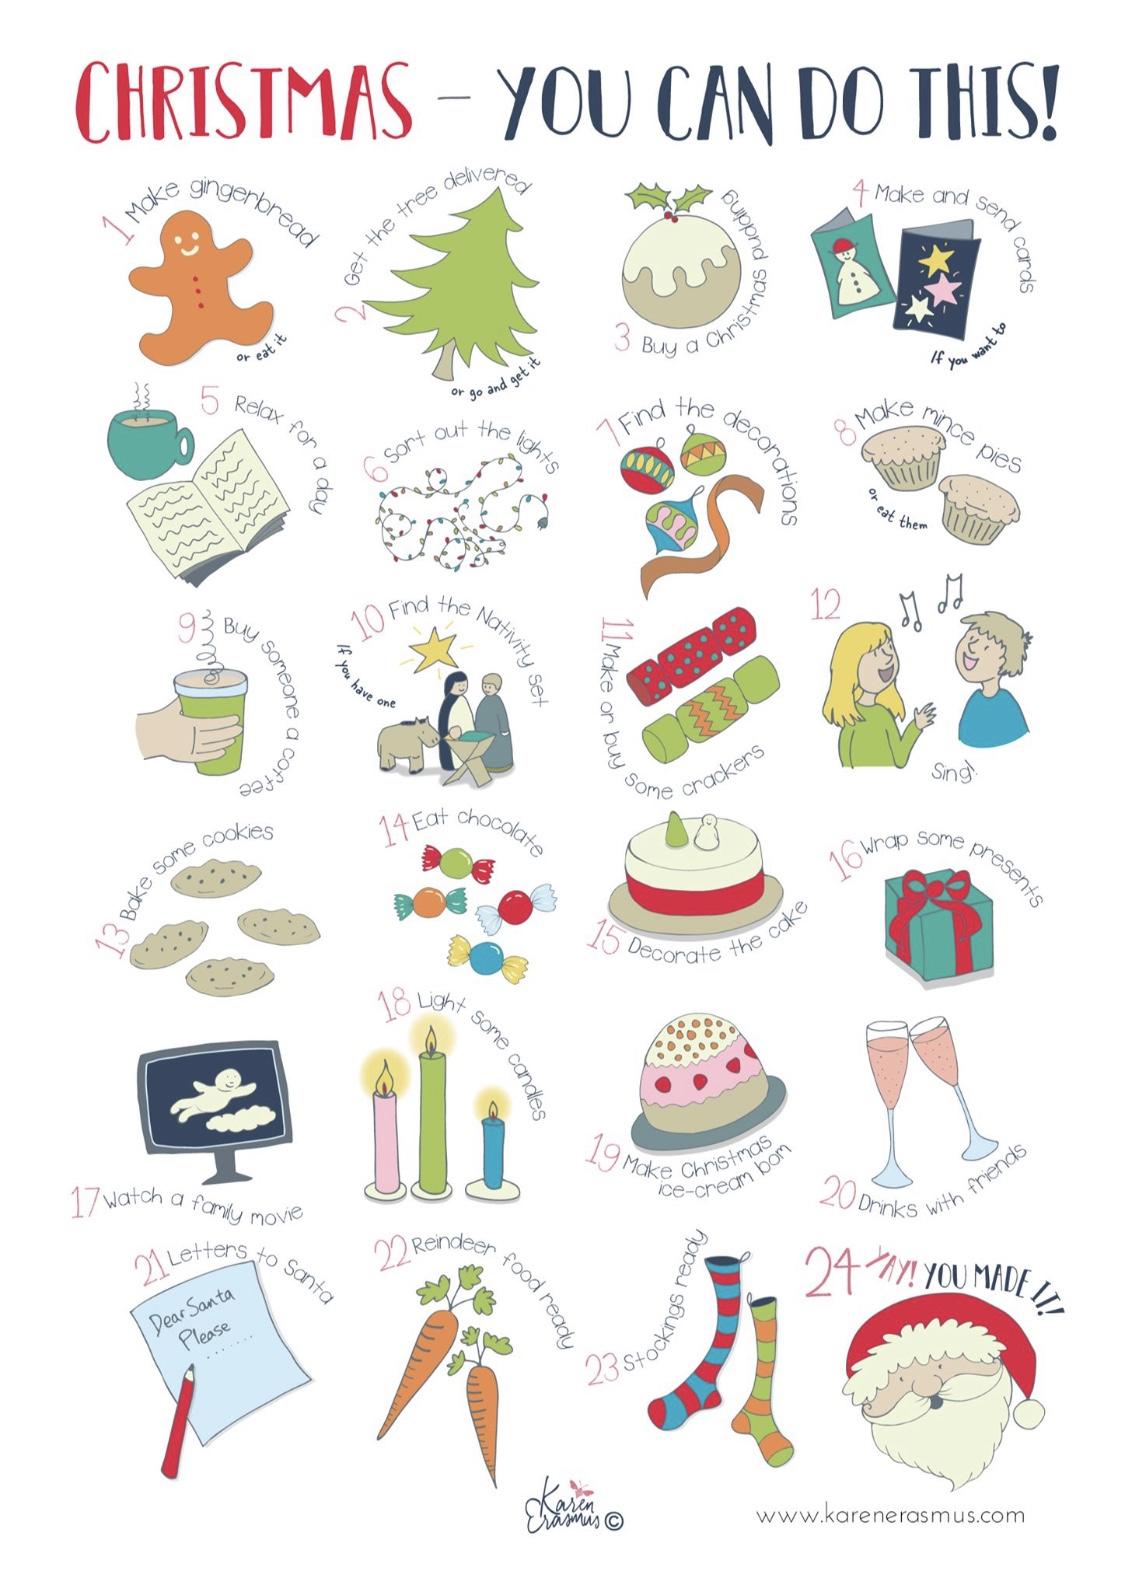 A fun illustrated advent calendar